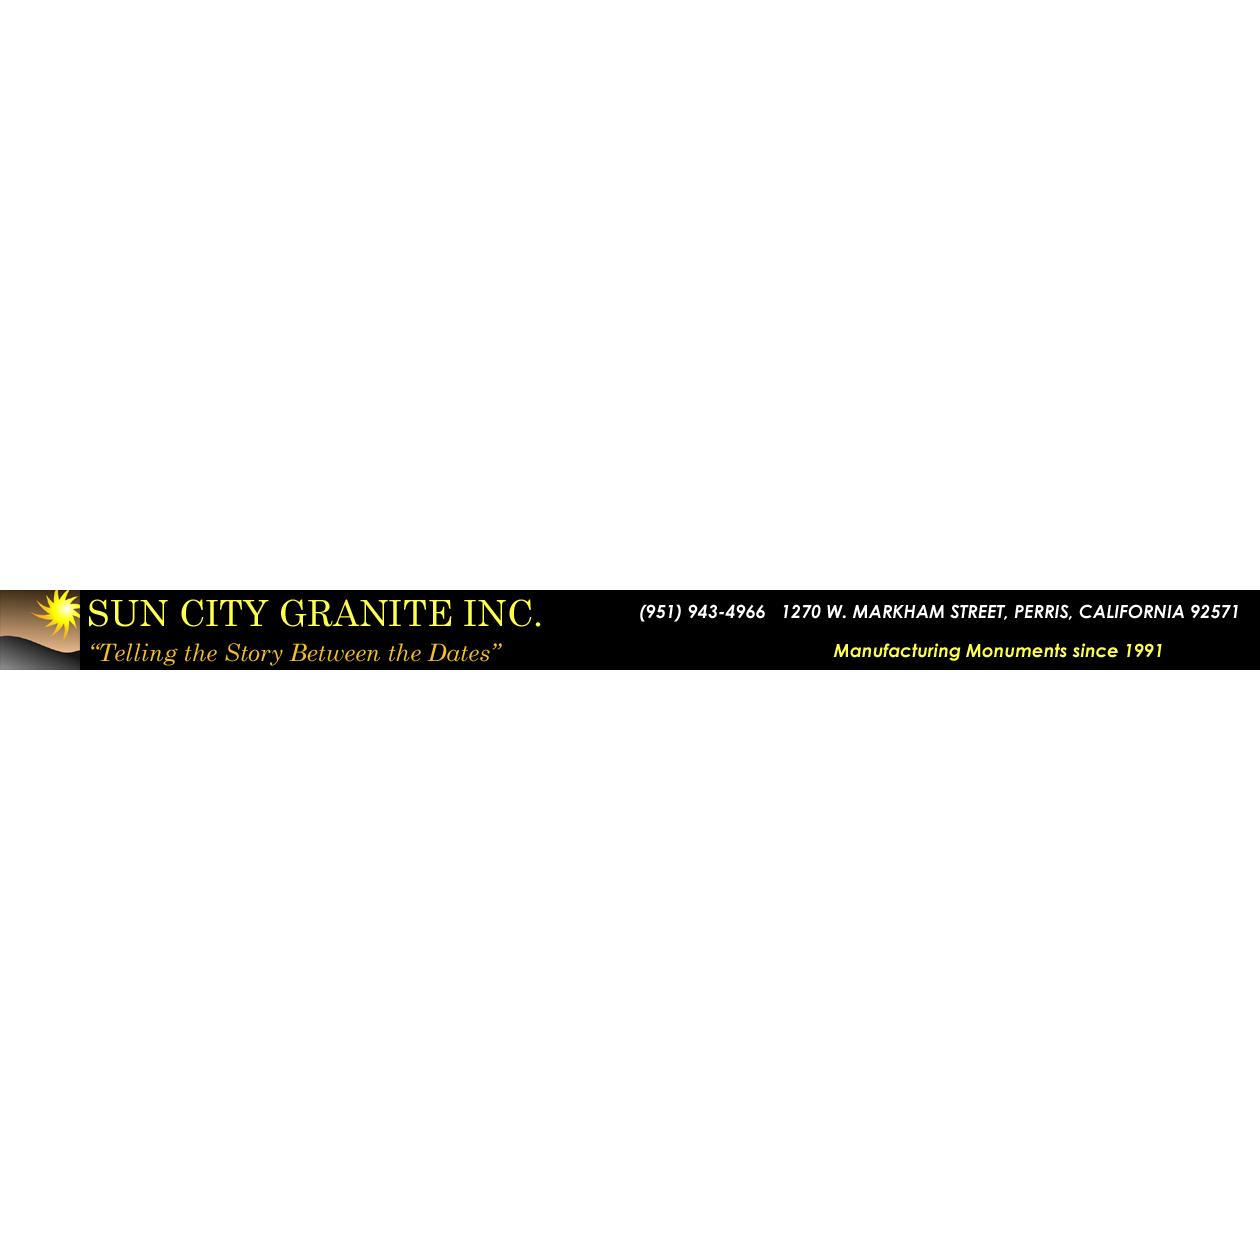 Sun City Granite Inc Headstones and Grave Markers